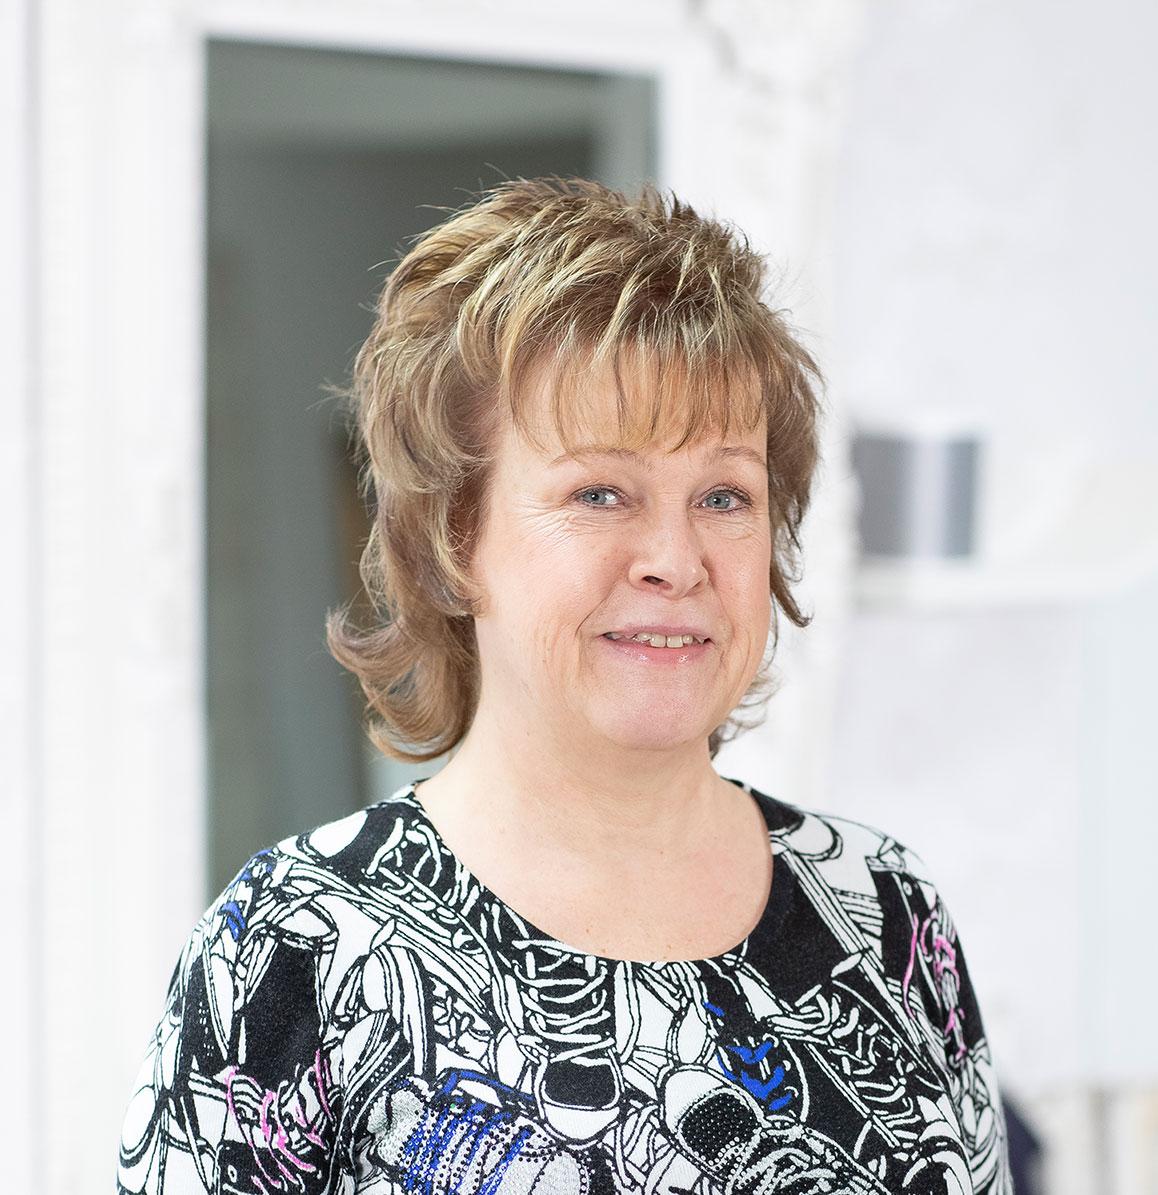 Angela Klingenberg